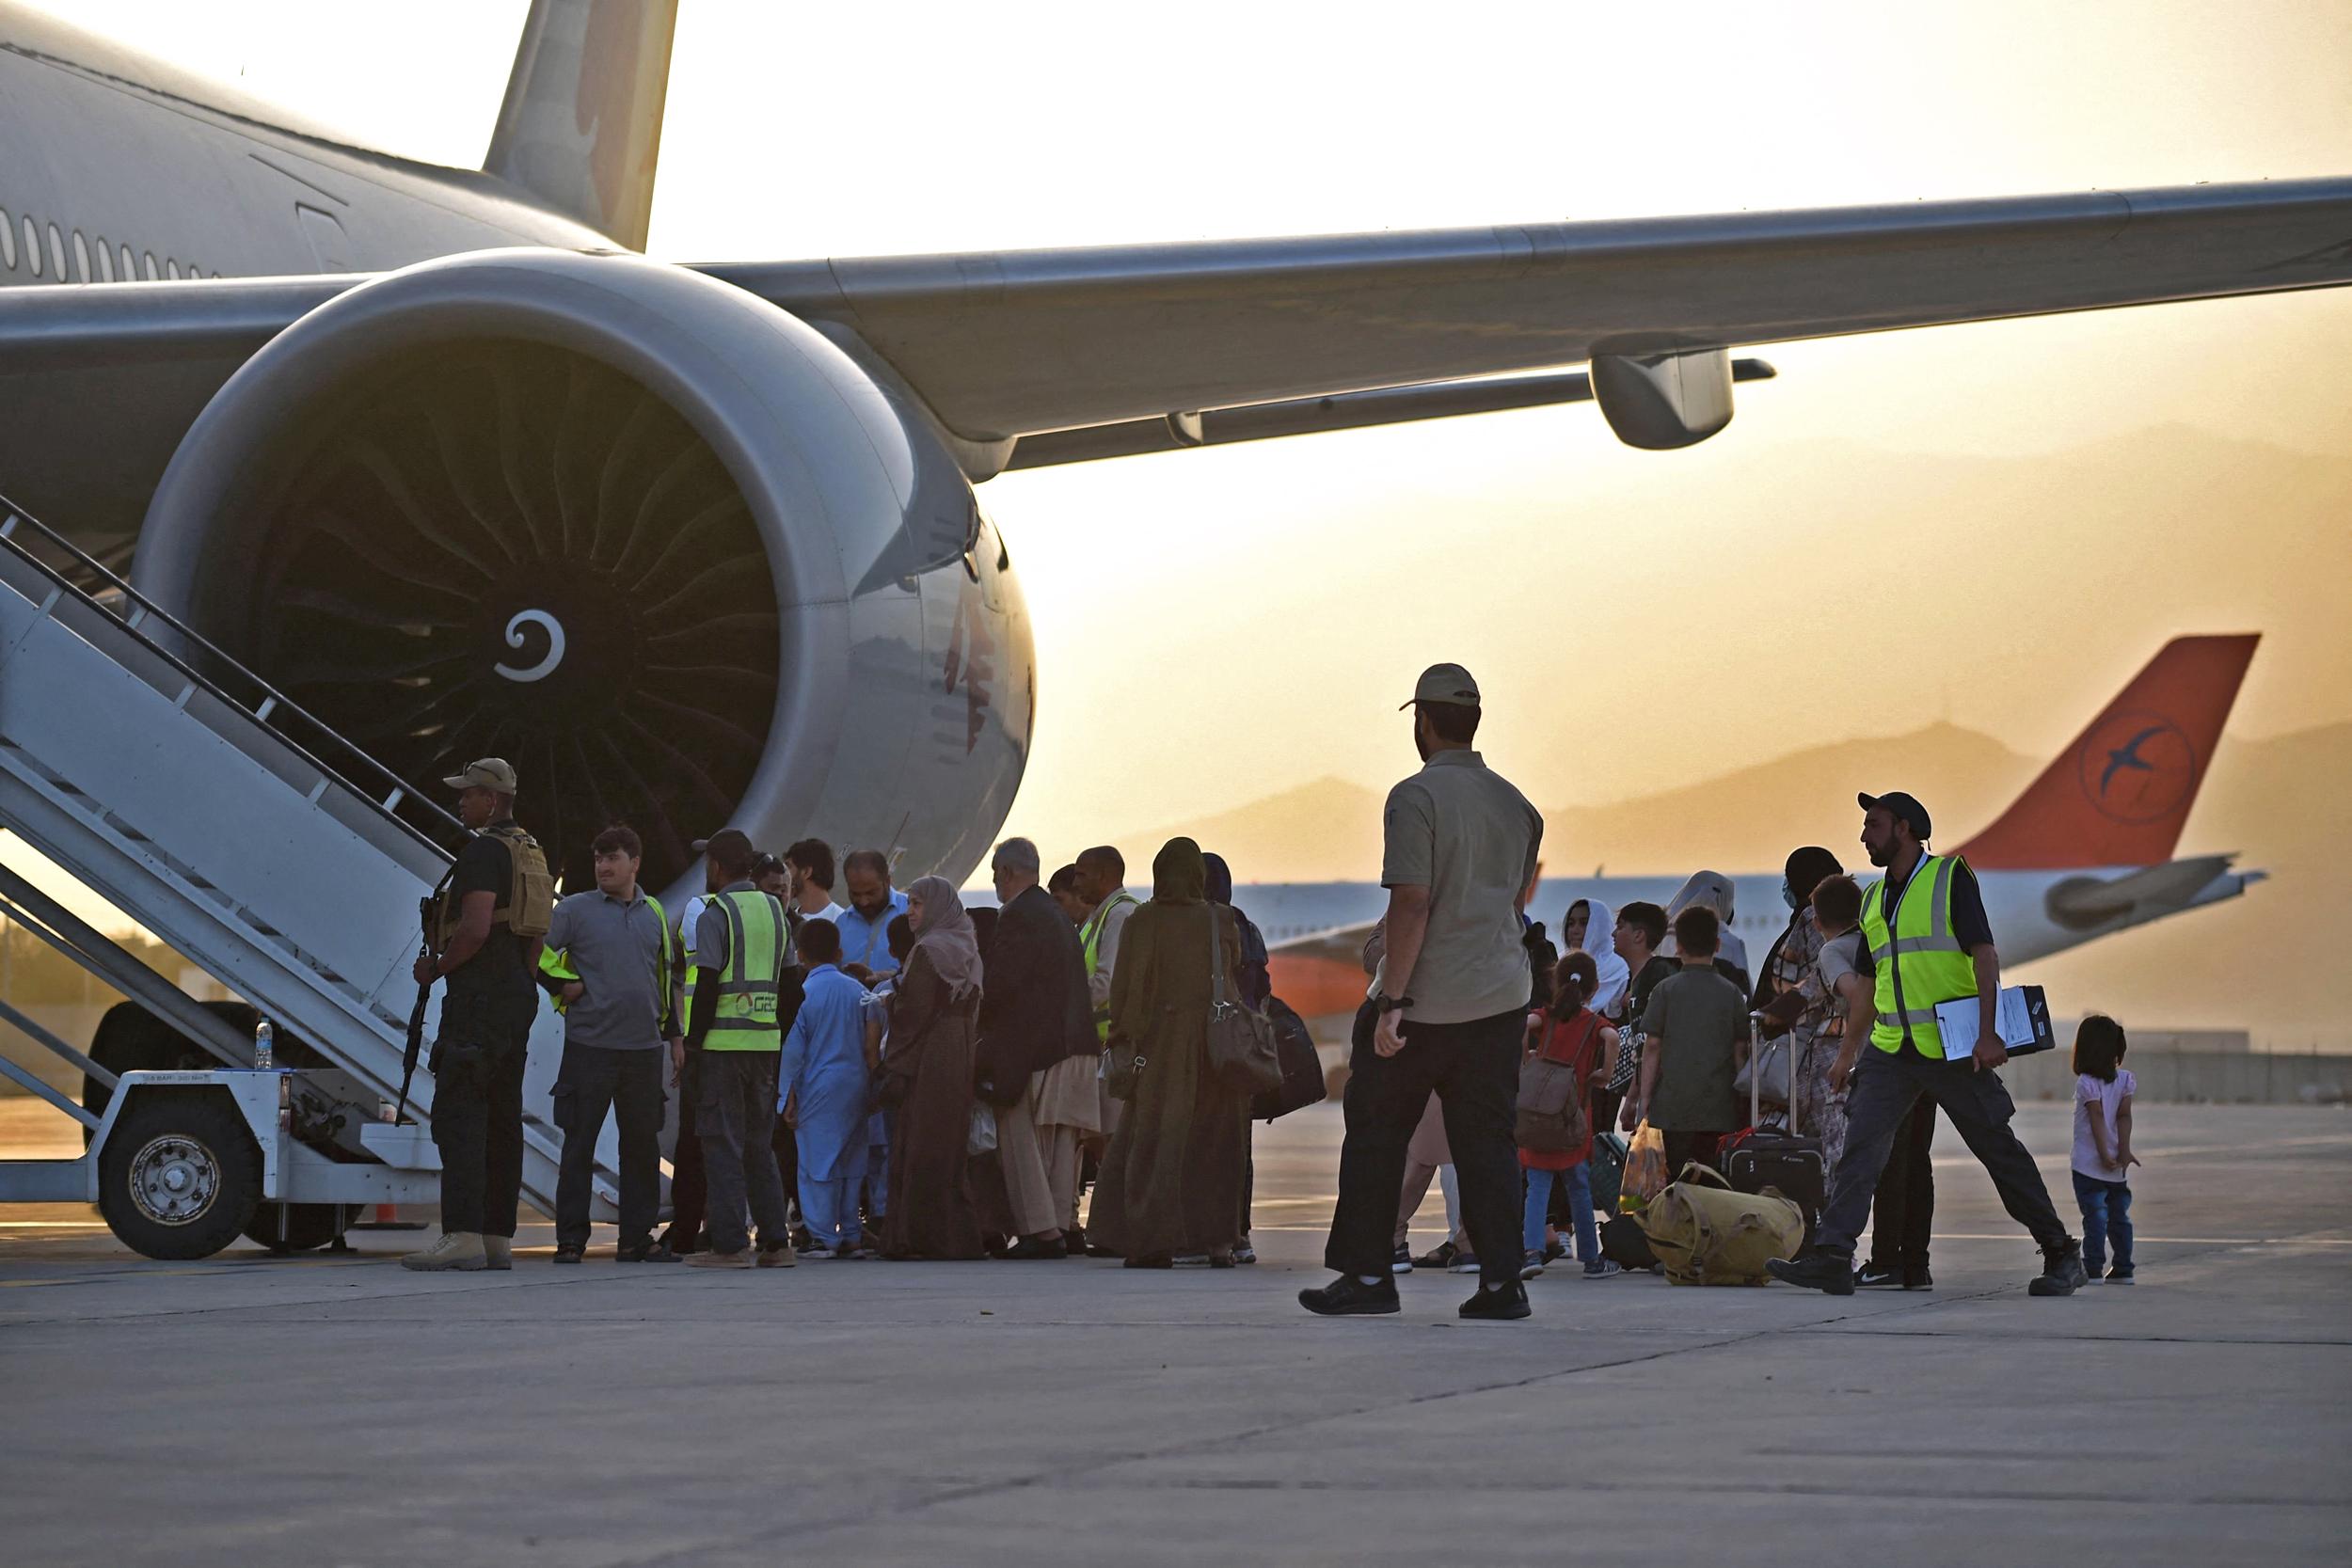 First international passenger flight departs from Kabul since U.S. exit